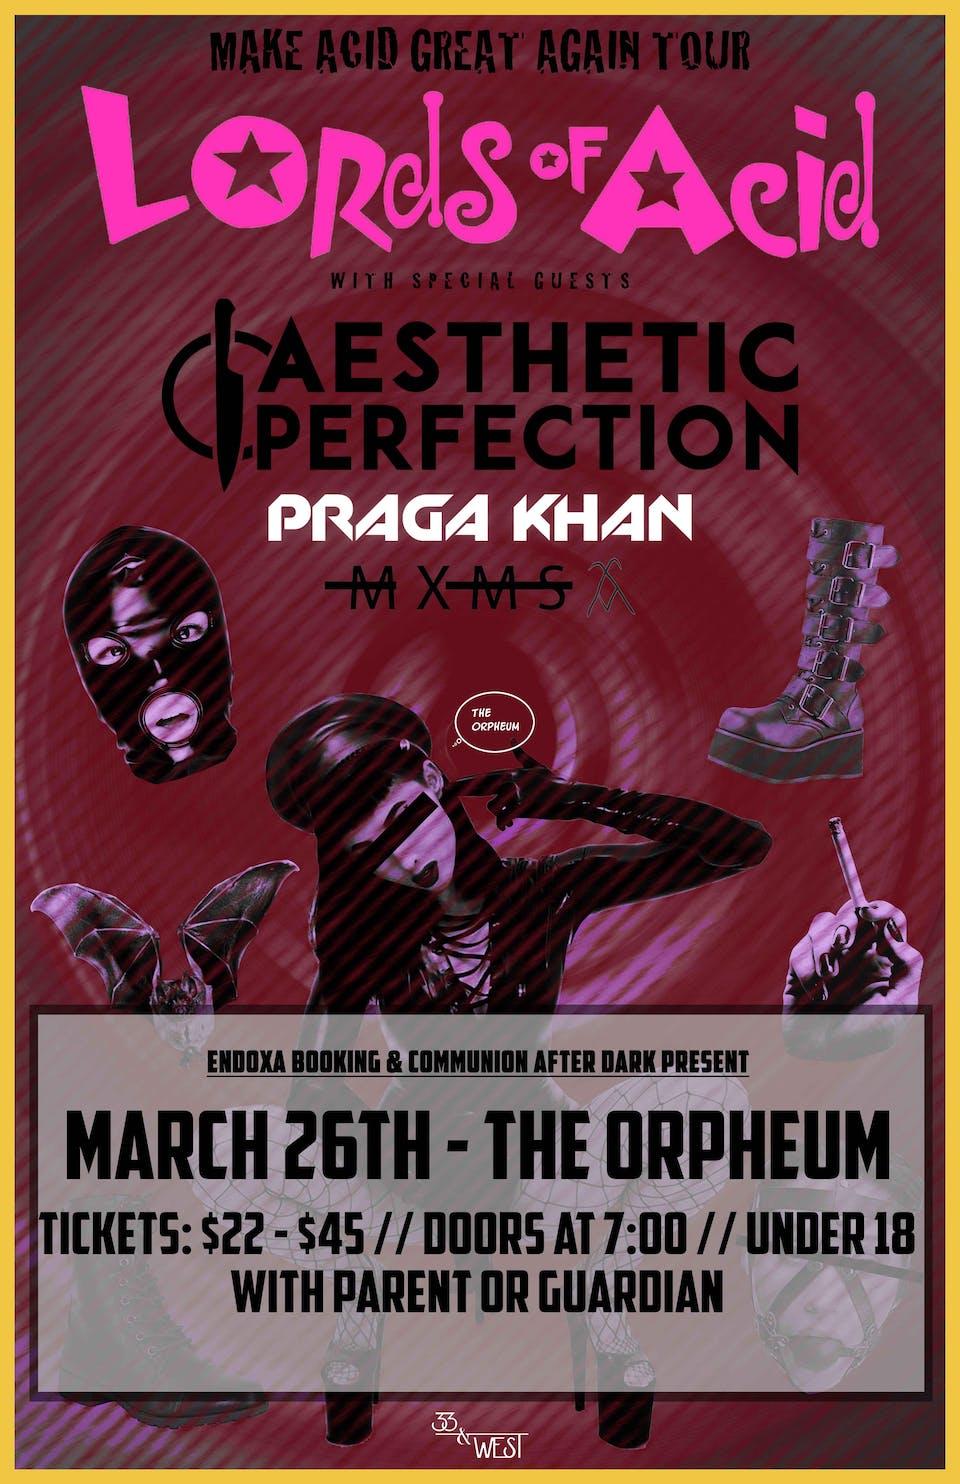 Lords of Acid, Aesthetic Perfection, Praga Khan (DJ Set) and MXMS in Tampa